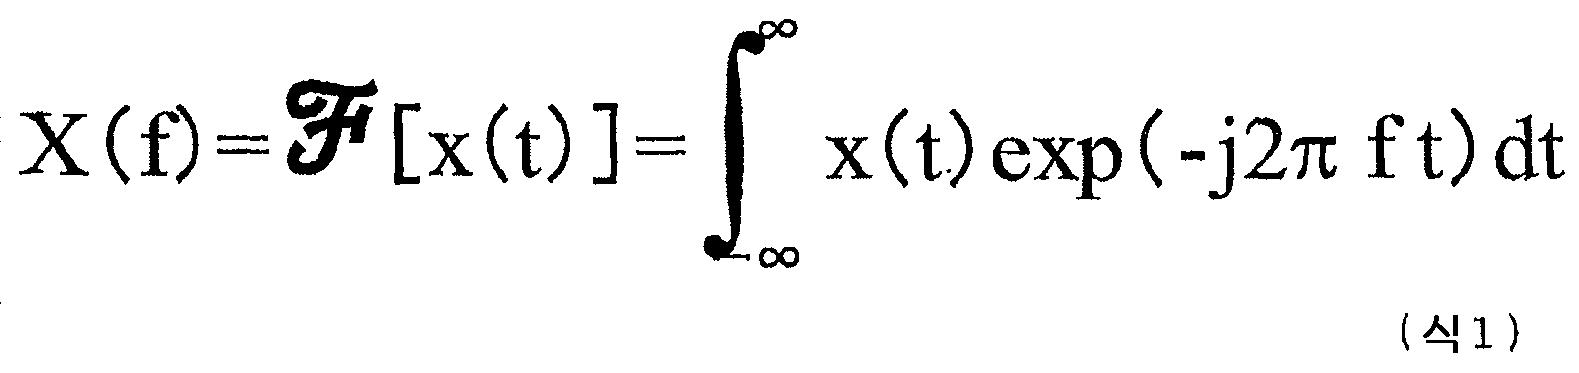 Figure 112012018602600-pct00001